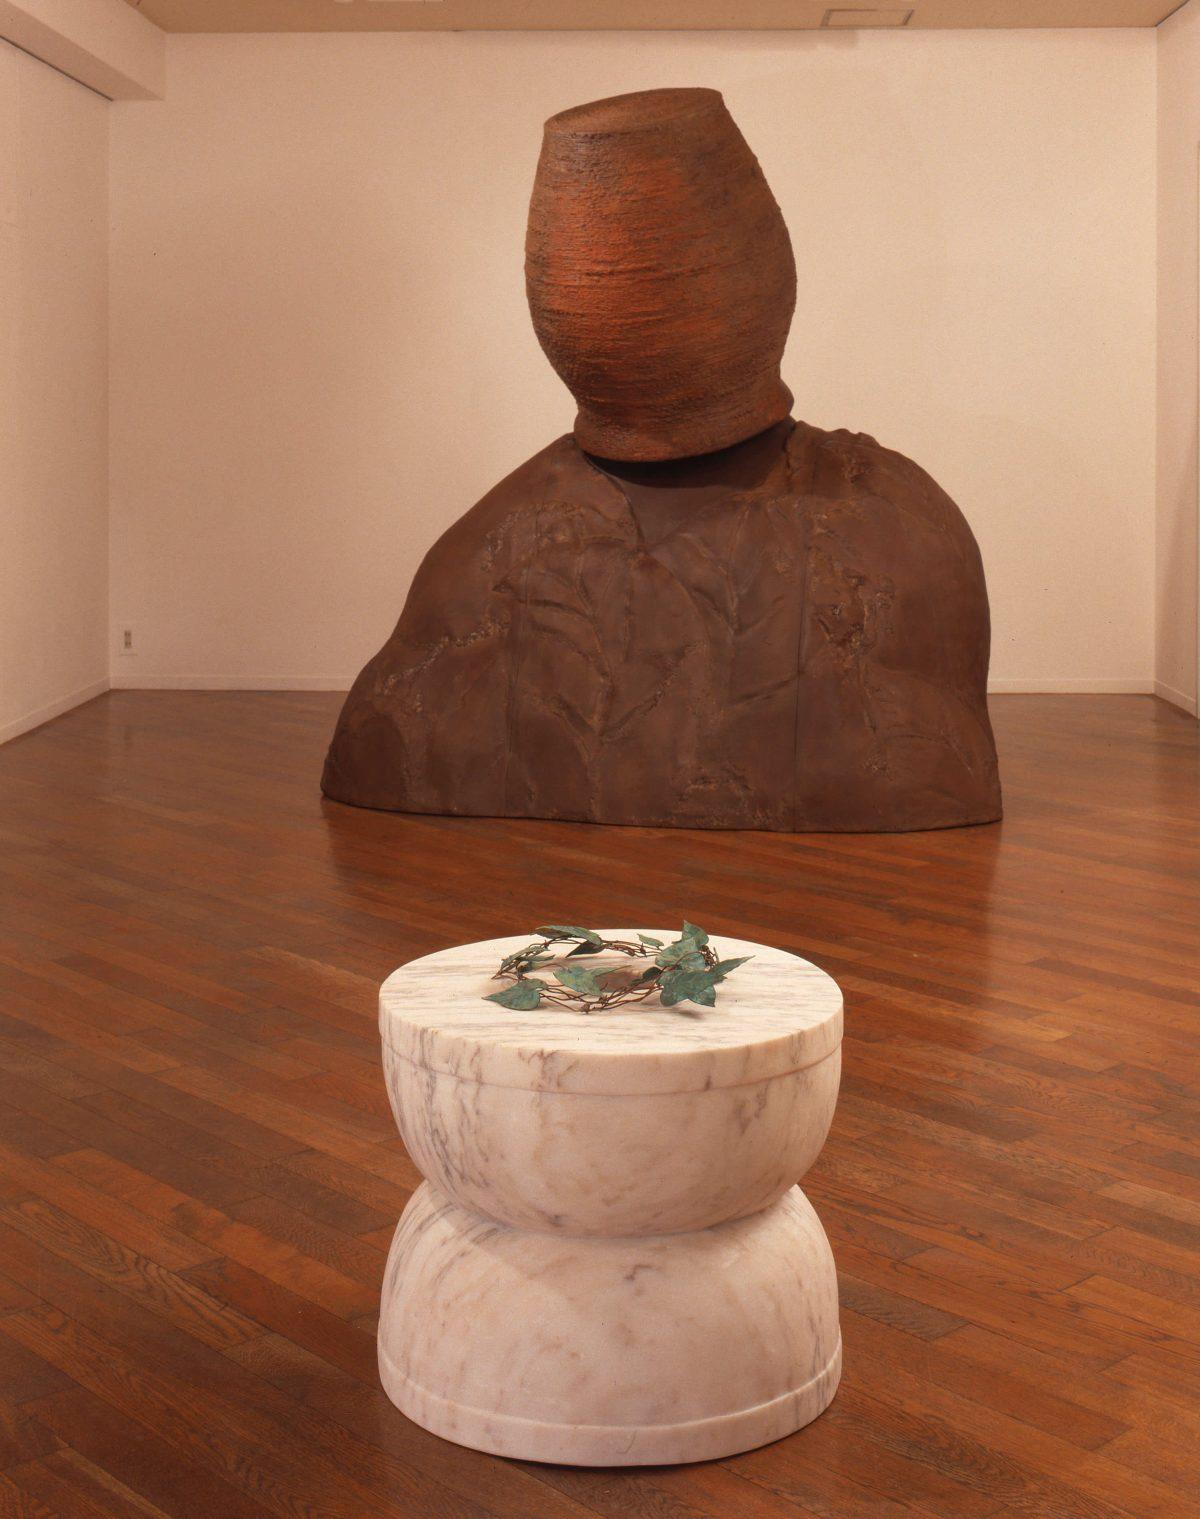 A Level、大理石、銅、水、46x50.5cm、1989